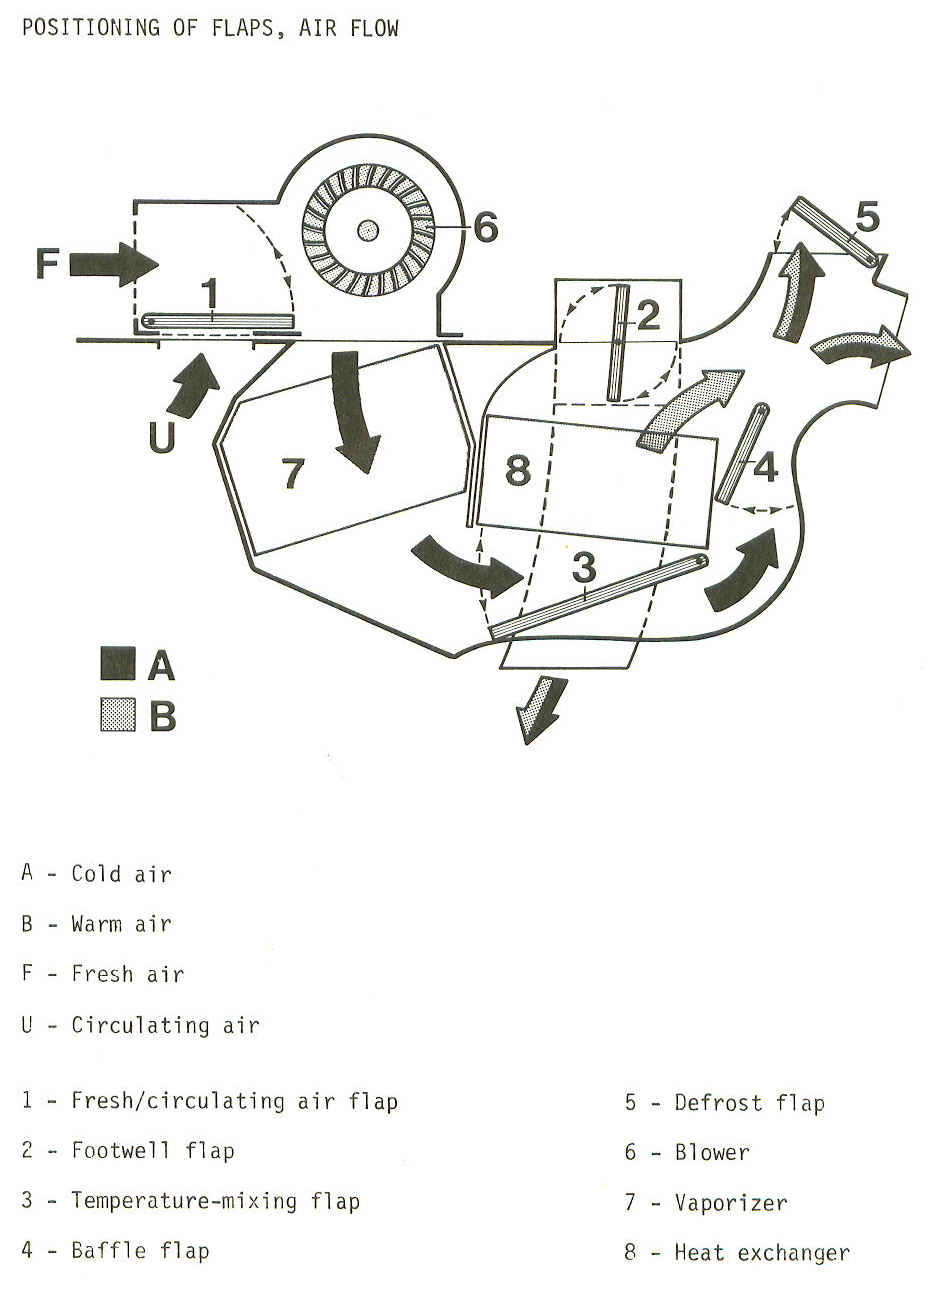 944 HVAC Operation and Malfunctions Hvac Schematic on hvac transformer, hvac condenser fans, hvac technology, hvac brands, hvac education, hvac layouts, hvac basics refrigeration, hvac cooling tower diagram, hvac workshop, hvac troubleshooting, hvac history, hvac refrigerant types, hvac flow diagram, hvac t stats, hvac tools, hvac sketches, hvac wiring diagrams, hvac systems, hvac home, hvac parts,